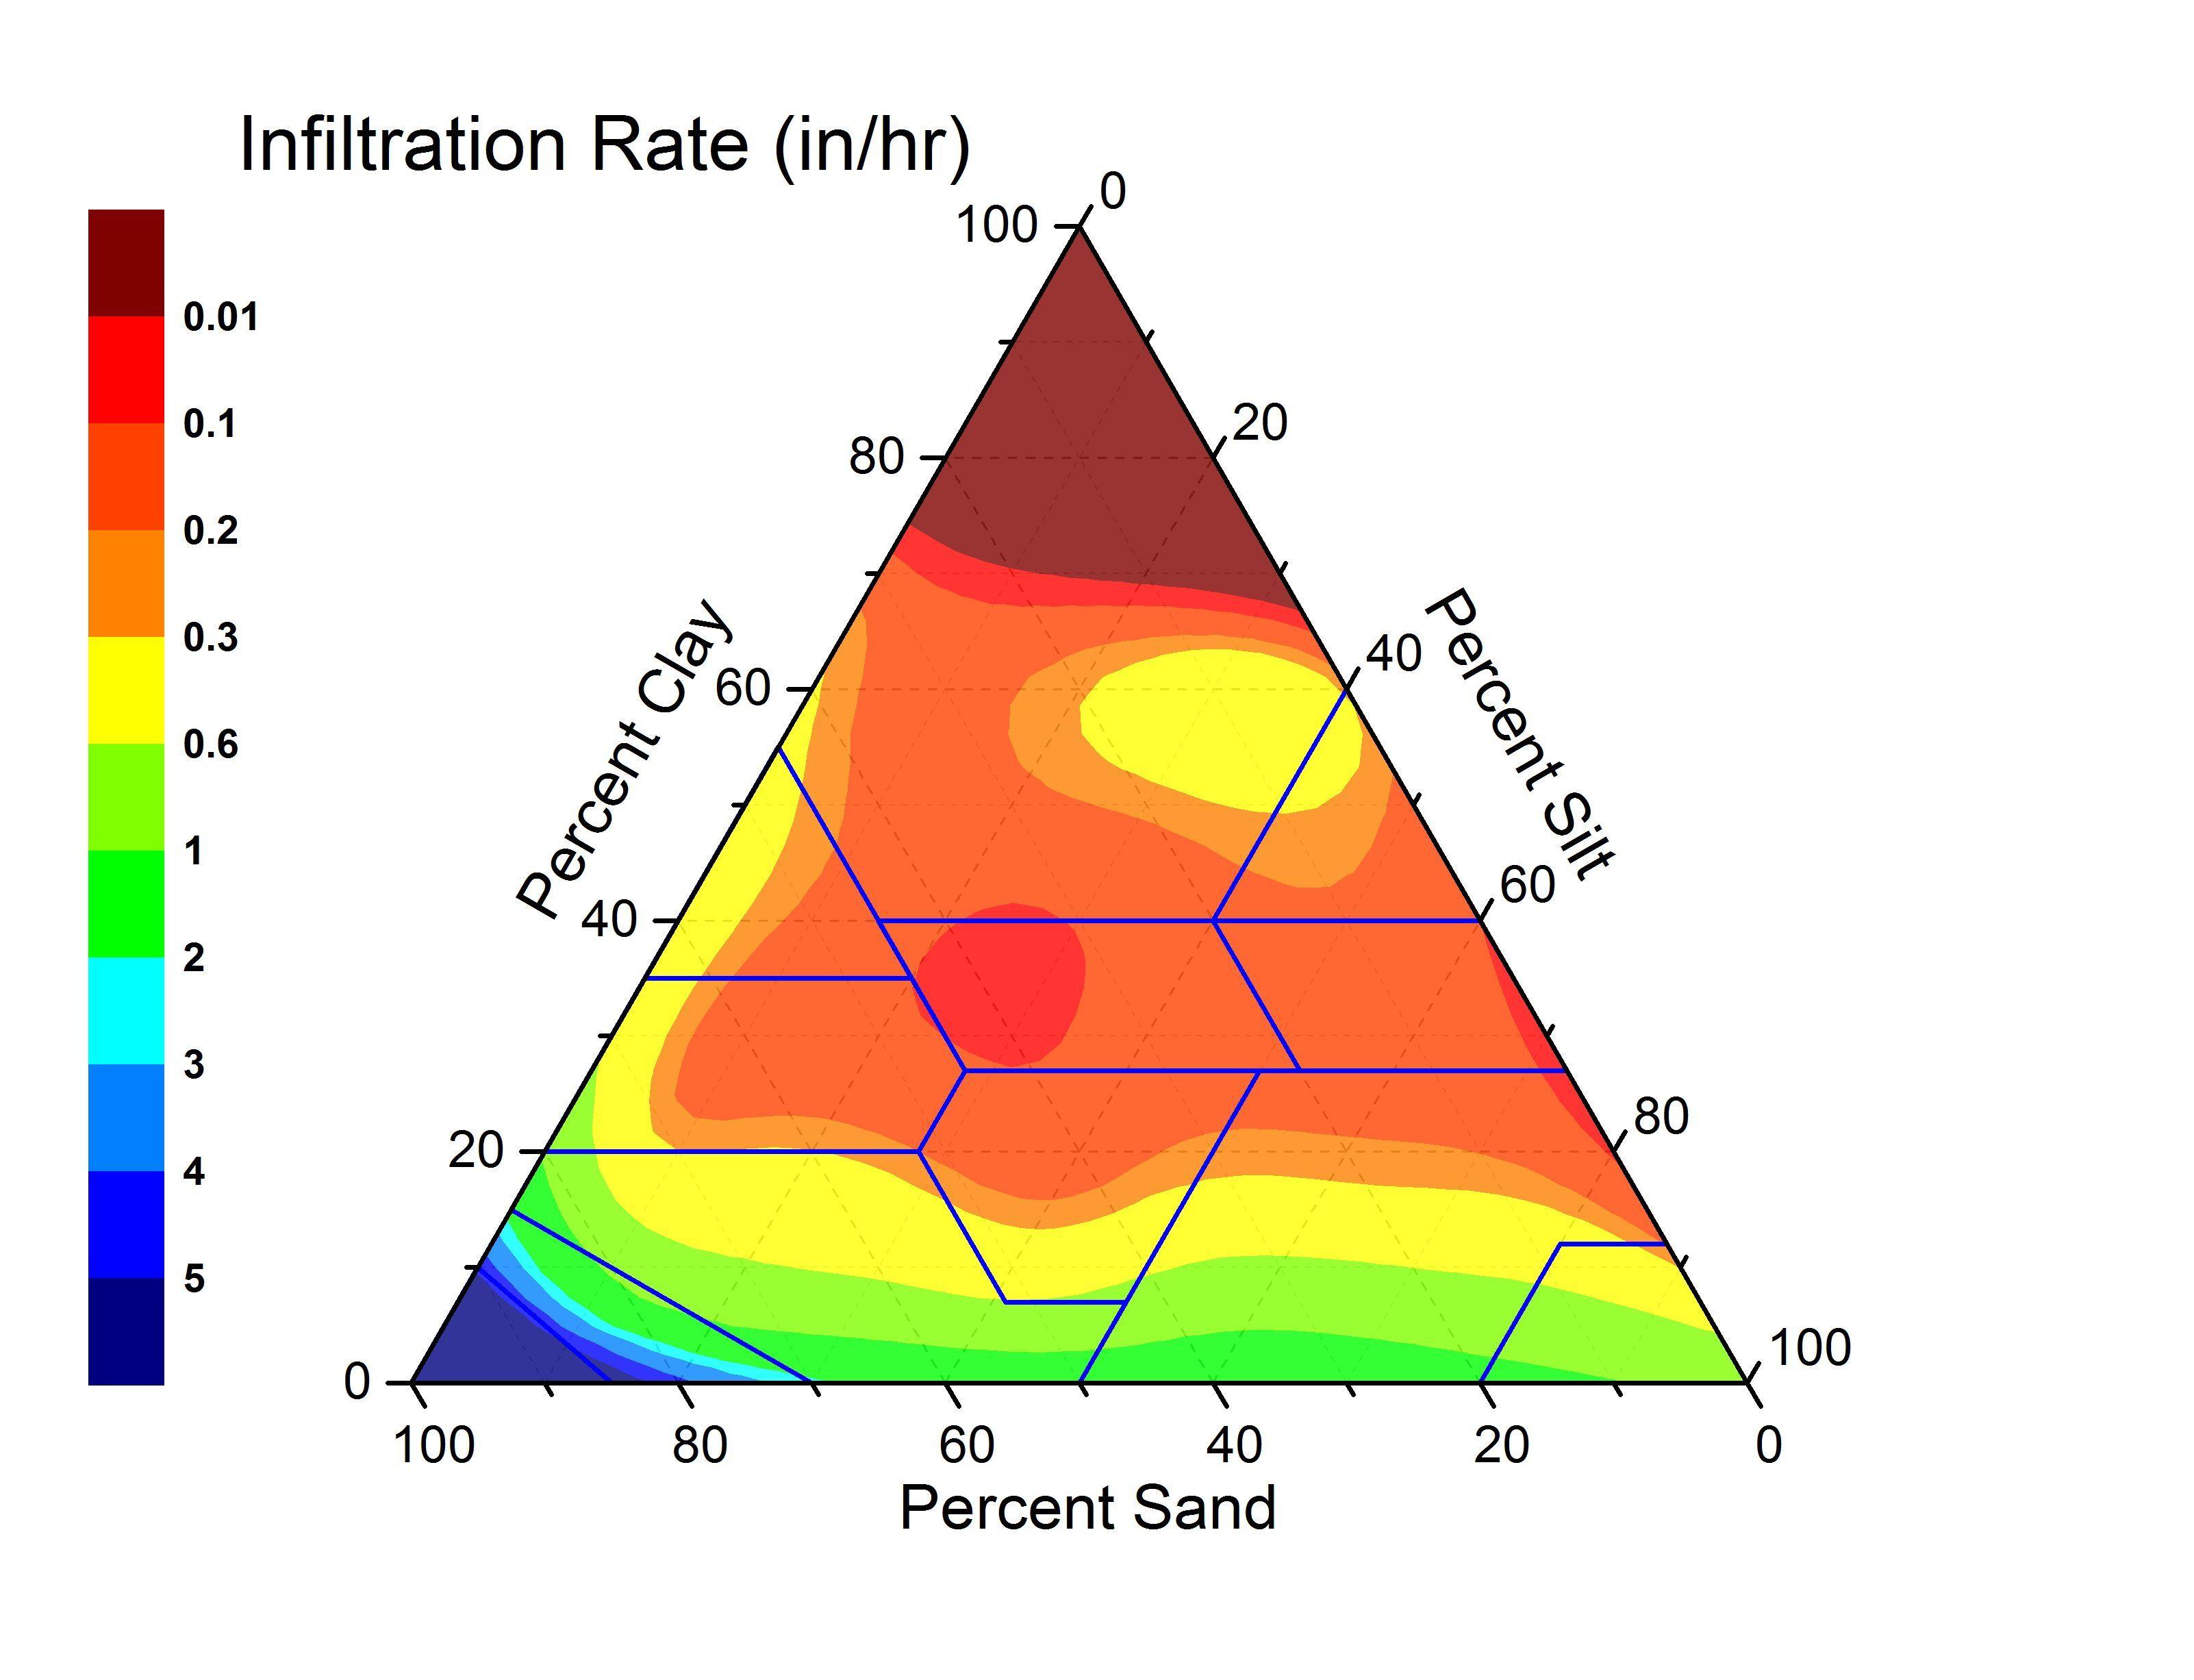 Infiltration Rate In H Usda Soil Triangular Diagram